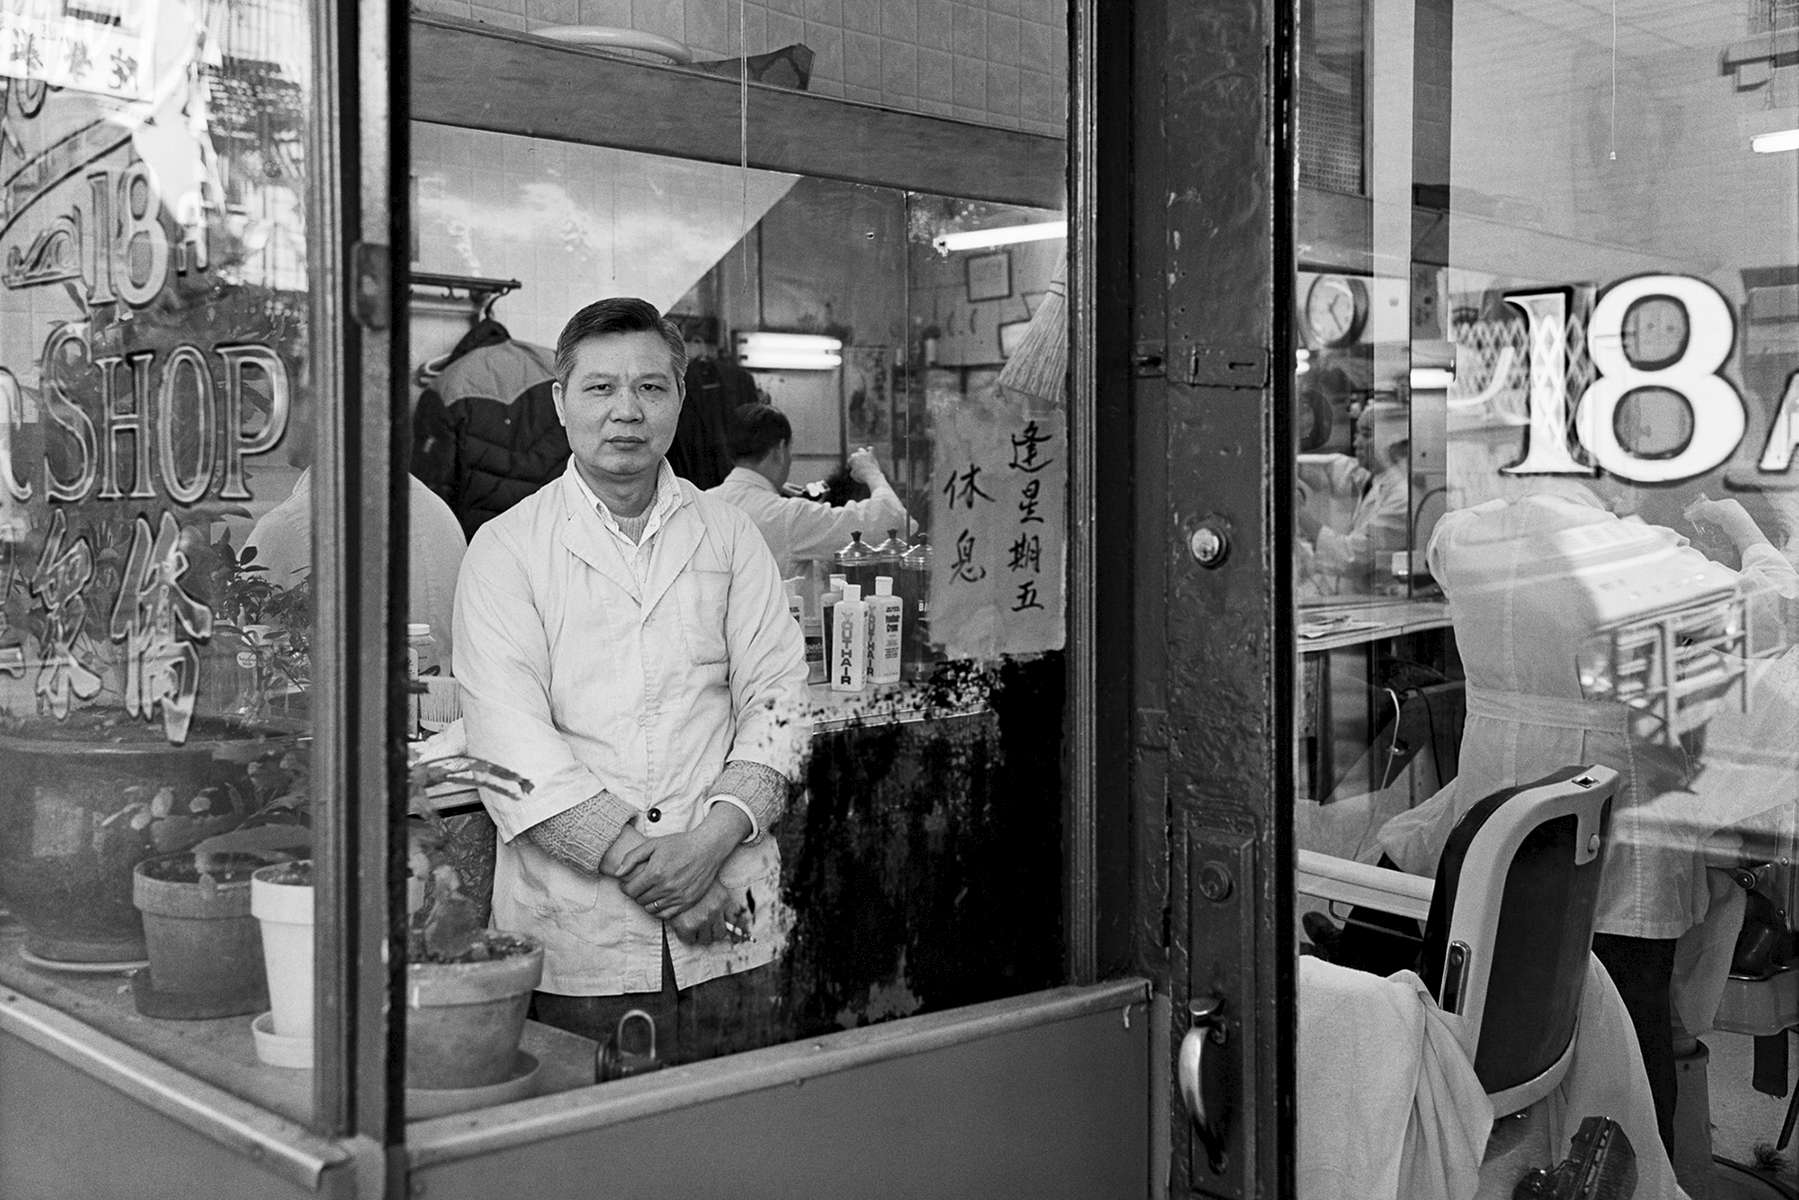 Kue Jong Barbershop, 18A Doyers St., 1981.